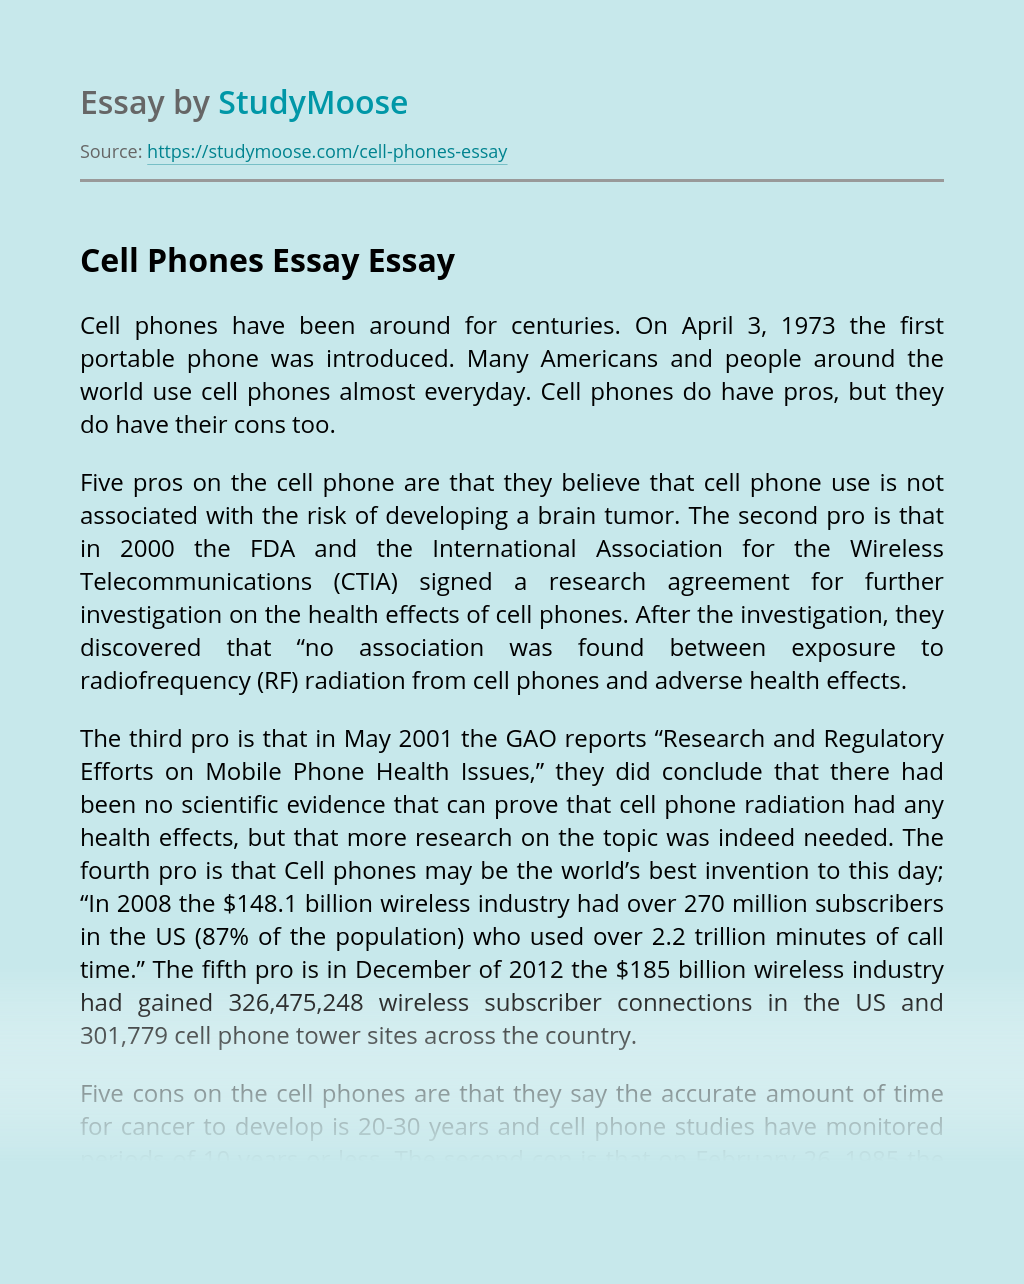 Cell Phones Essay